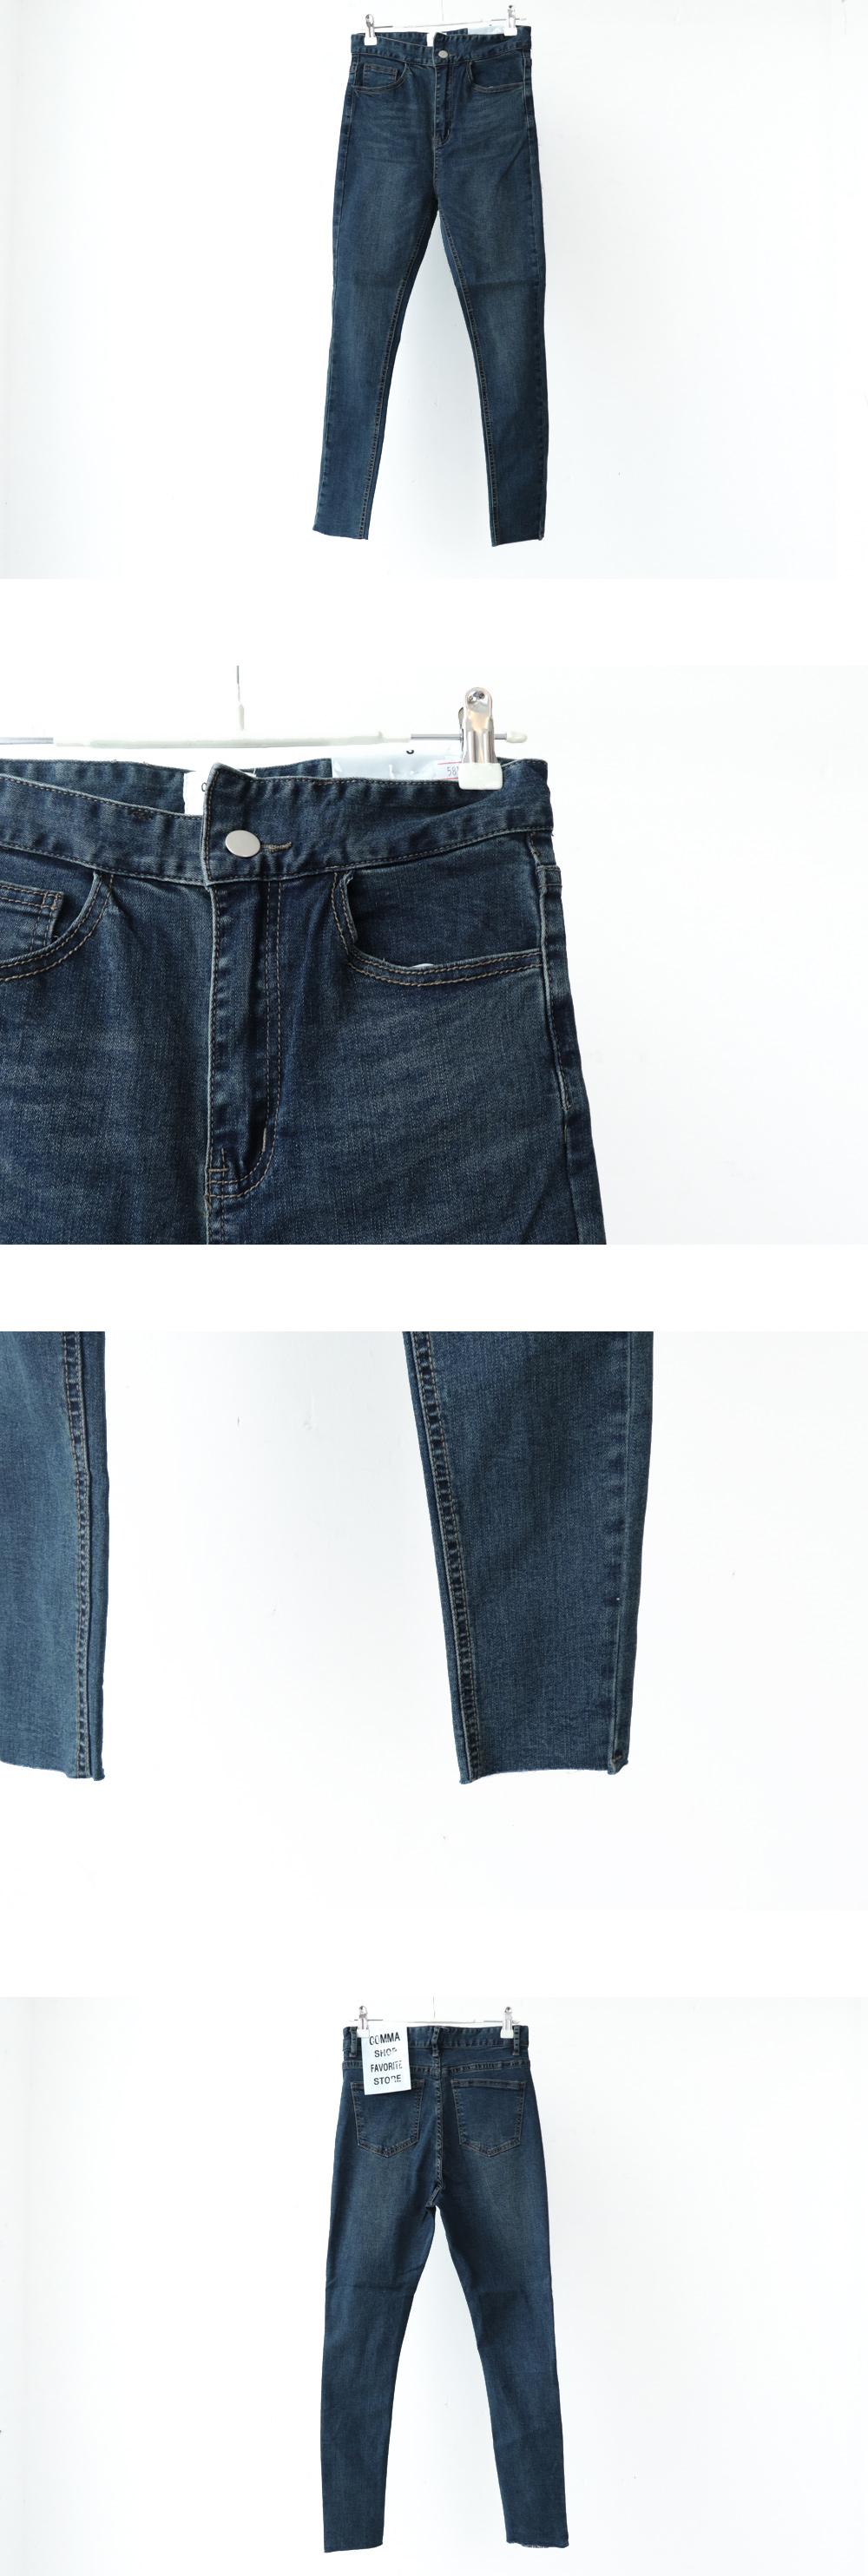 5815 waist unfooted skinny jeans